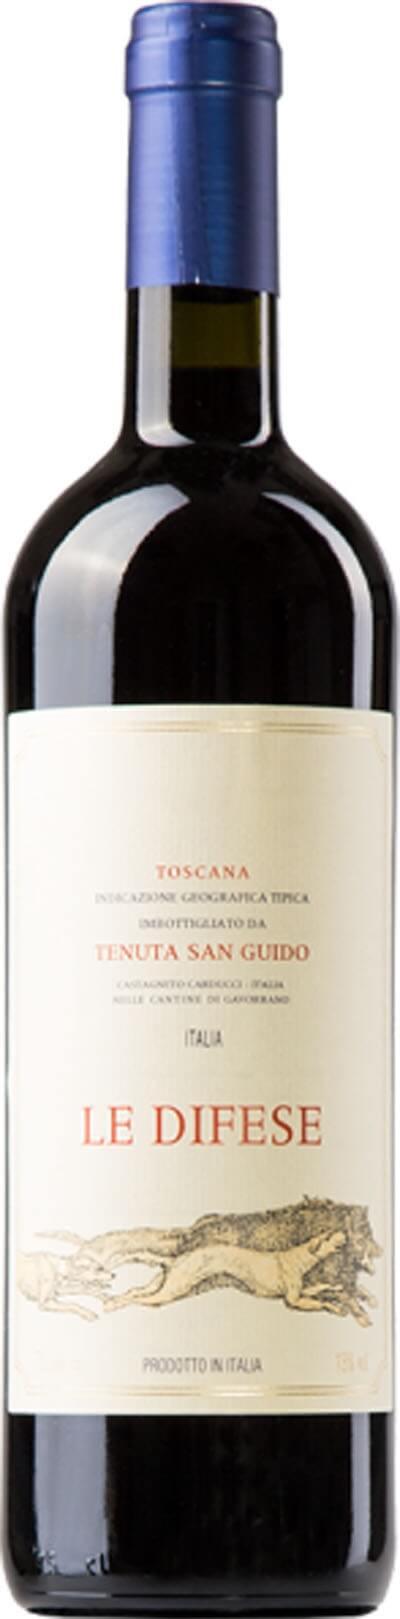 Le Difese Toscana IGT 2017 / Tenuta San Guido